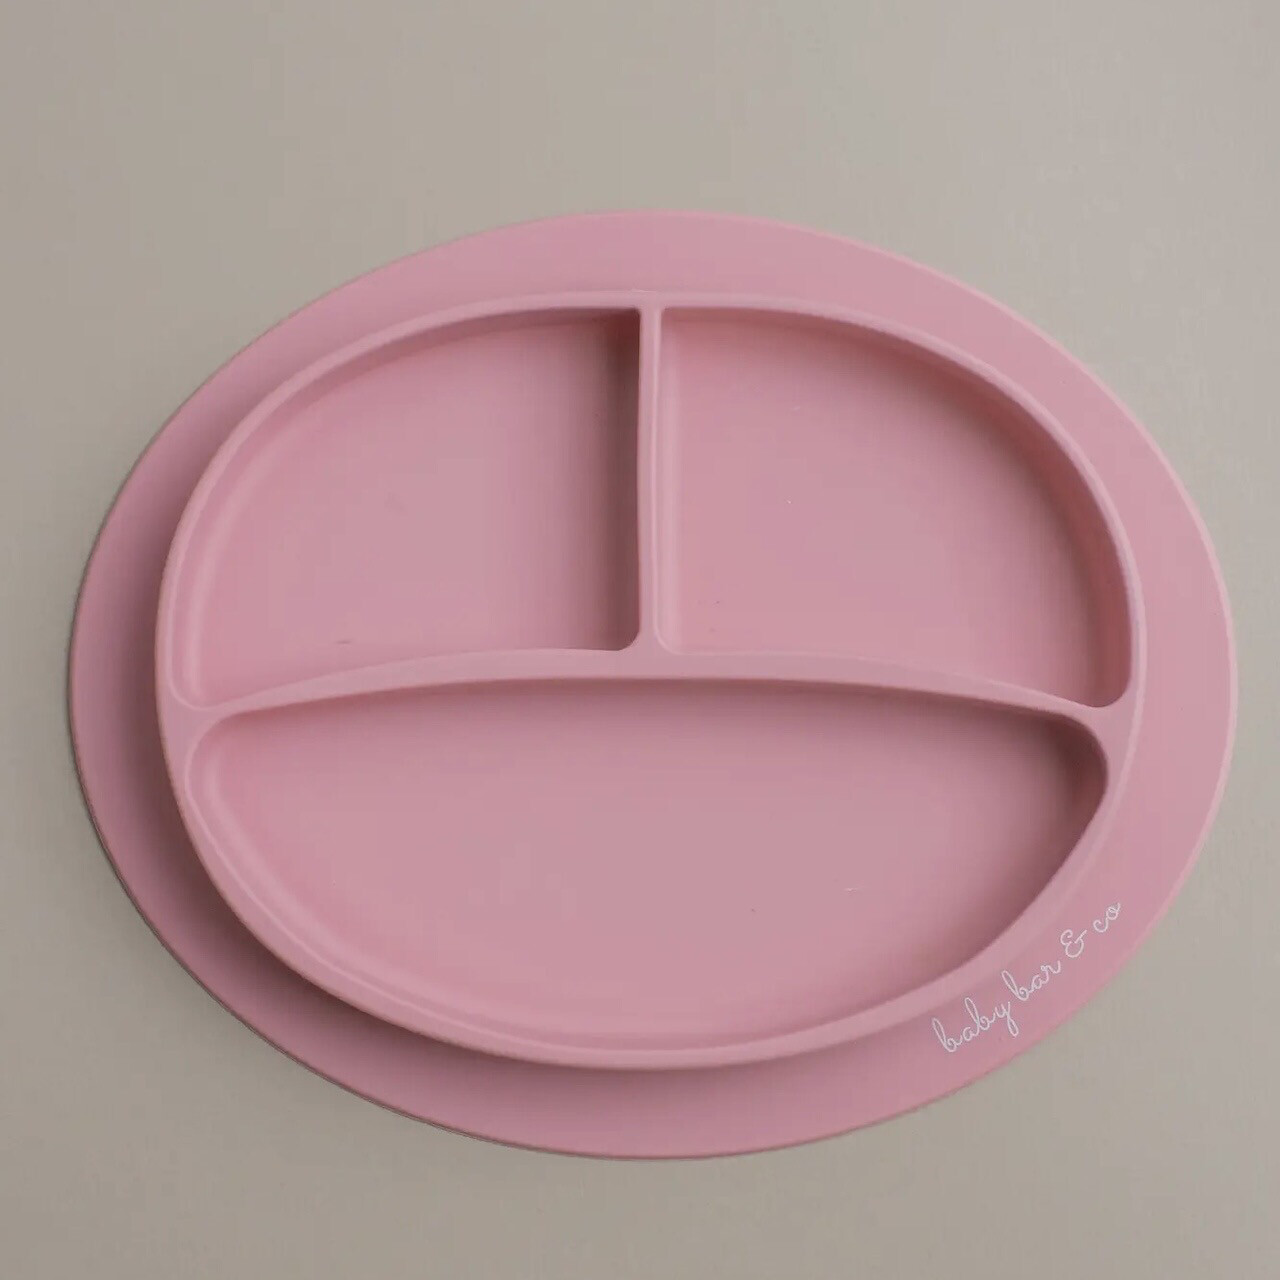 Three Hearts Silicone Plate